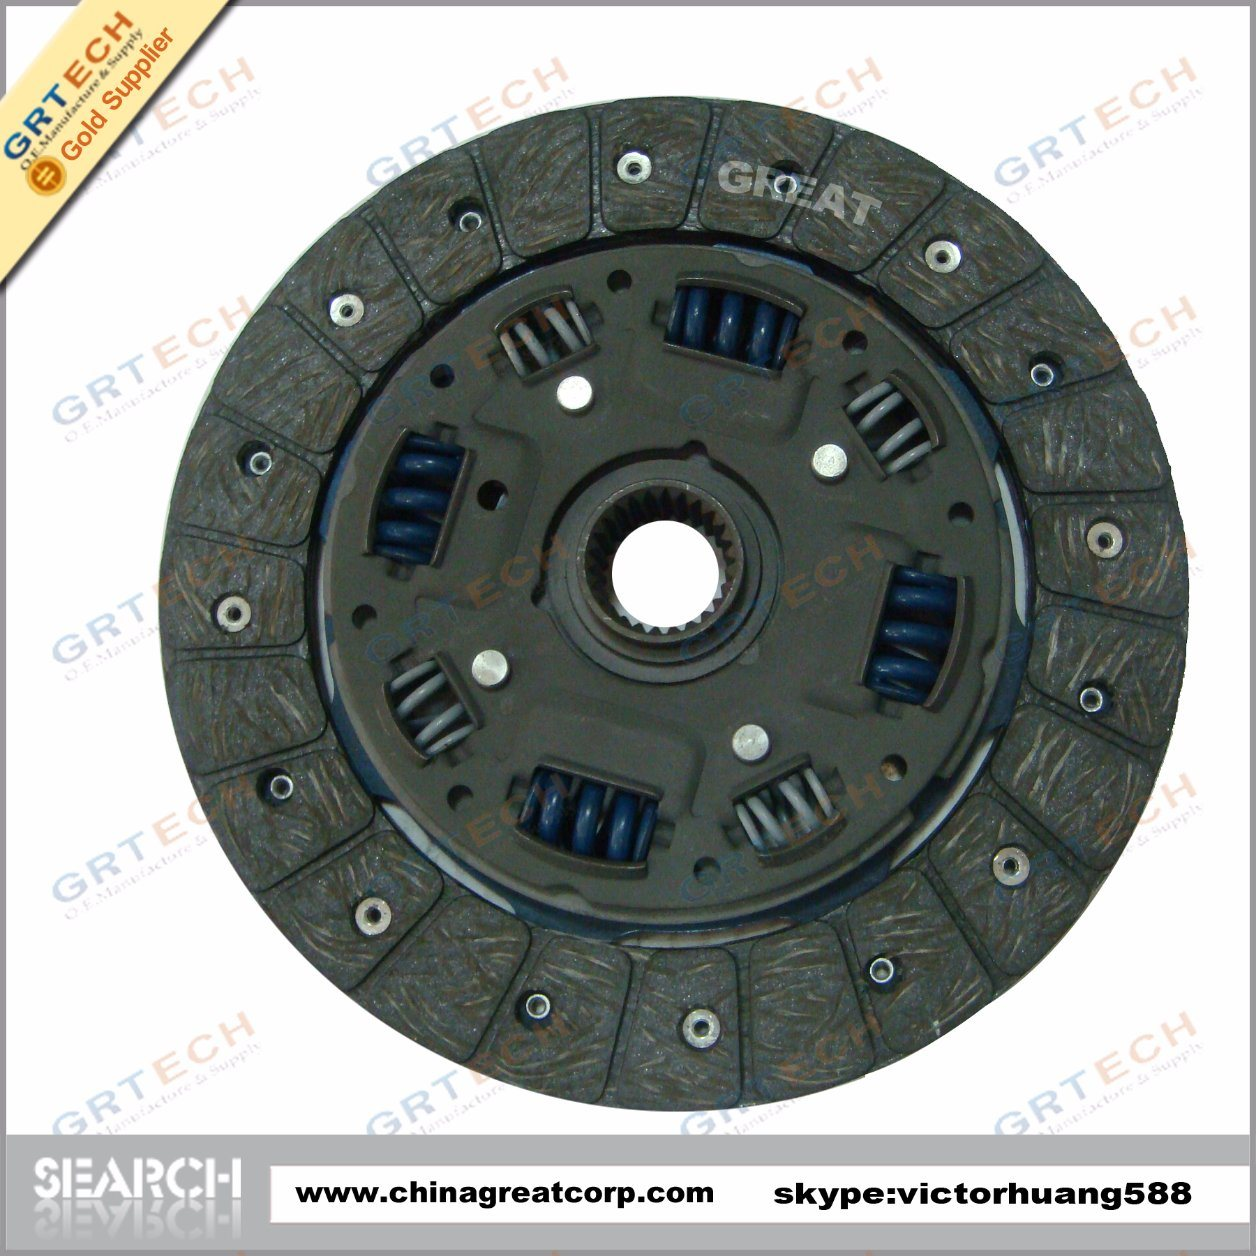 Auto Clutch Kits and Clutch Pressure Plate Clutch Discs for Paken